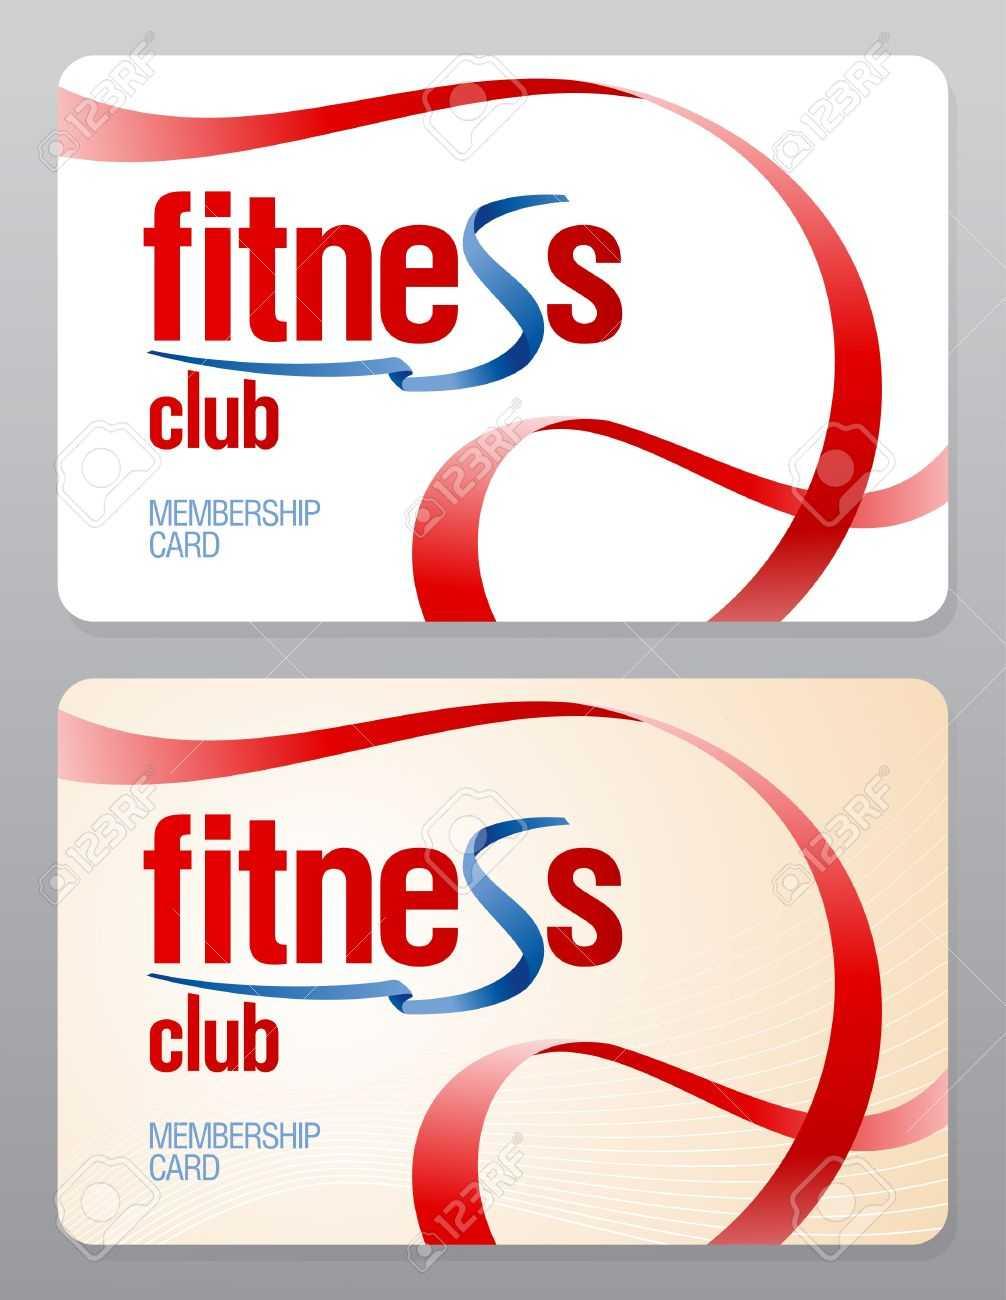 Fitness Club Membership Card Design Template. For Gym Membership Card Template